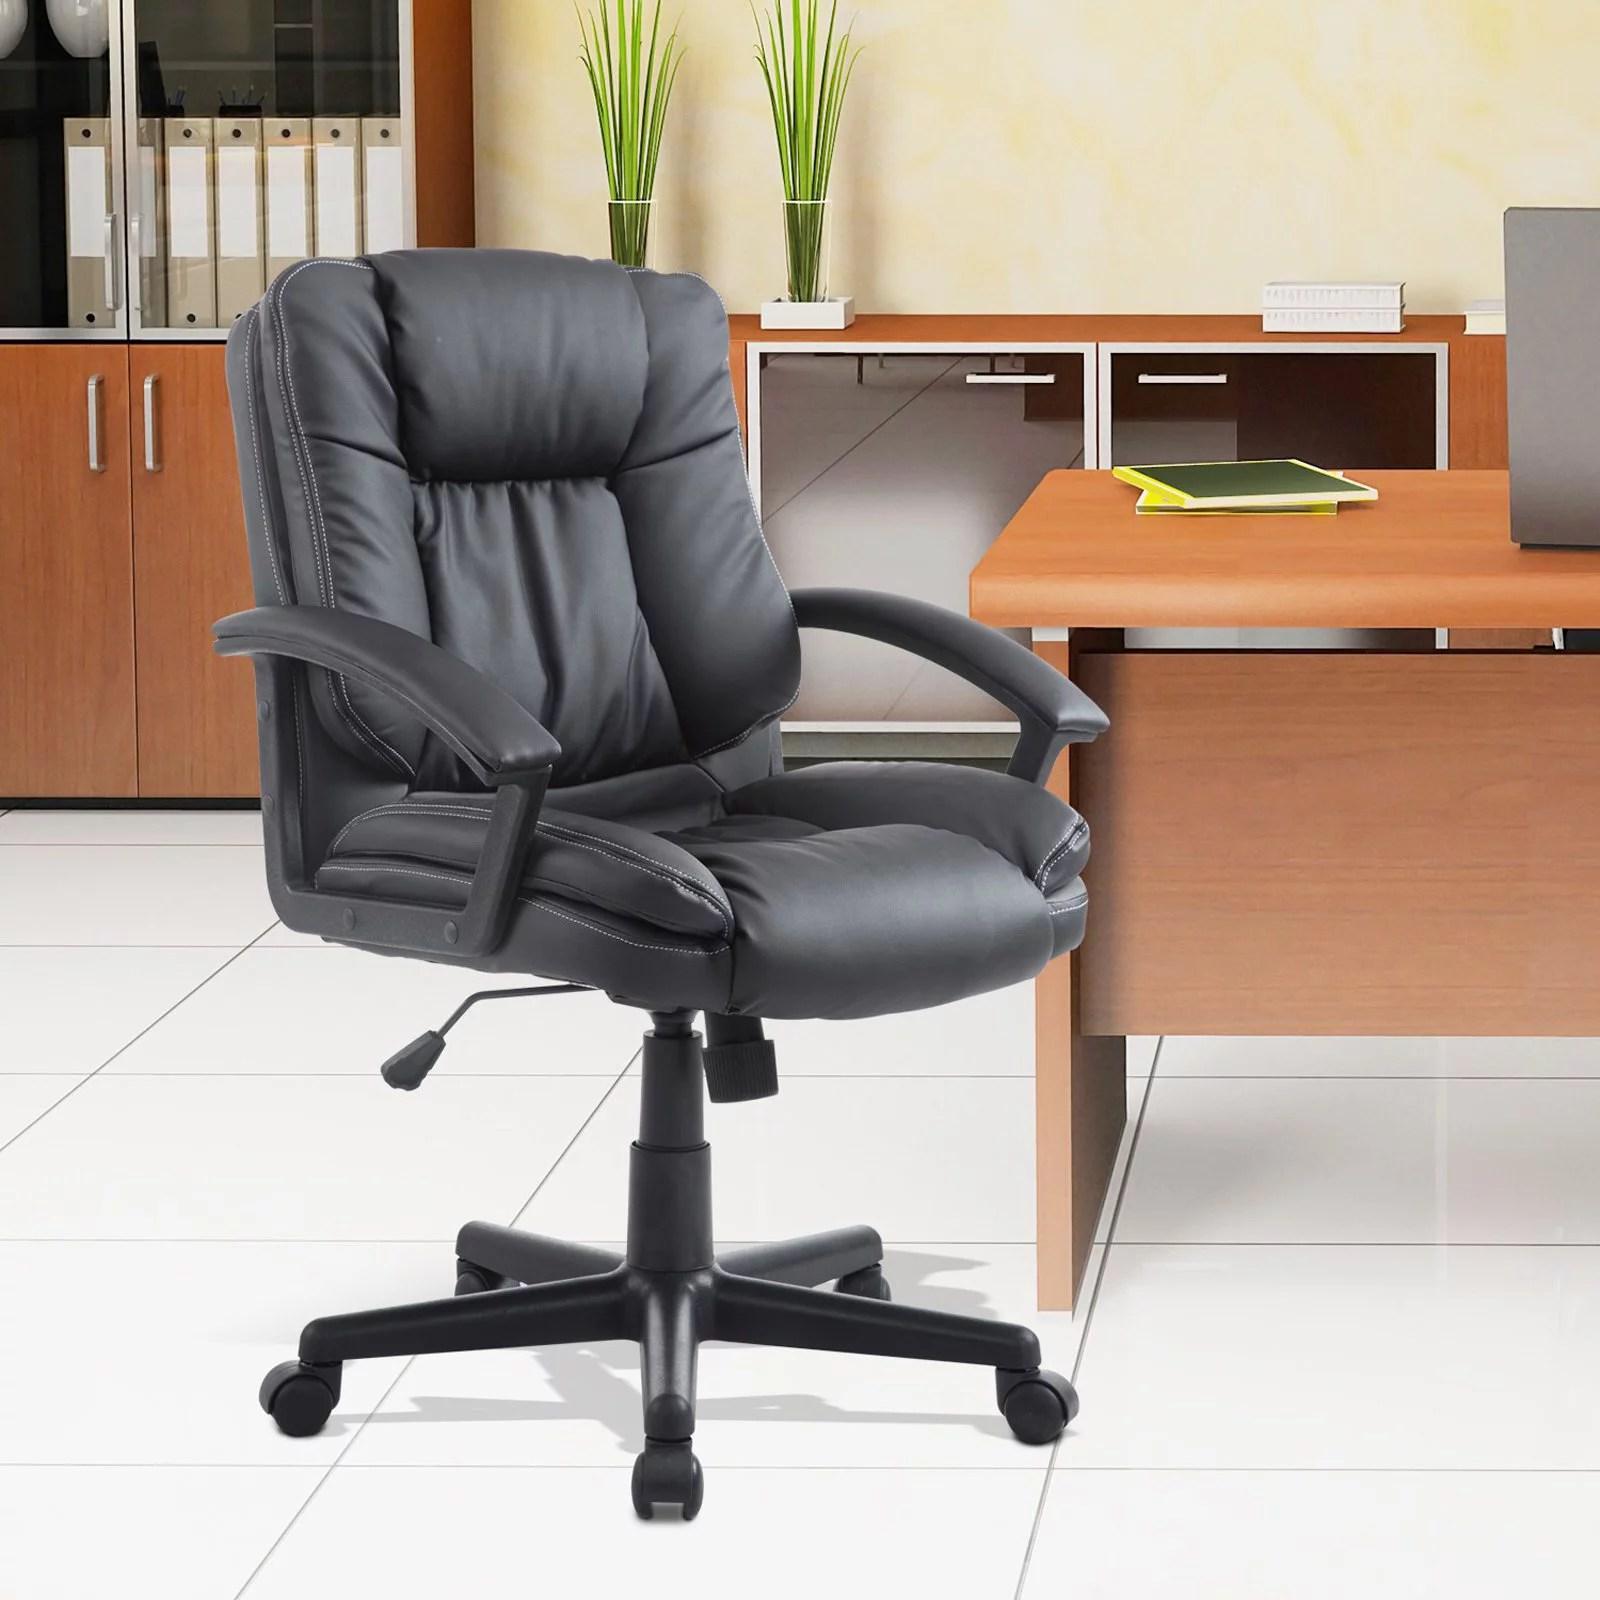 leather executive office chair chromcraft parts homcom mid back faux desk walmart com